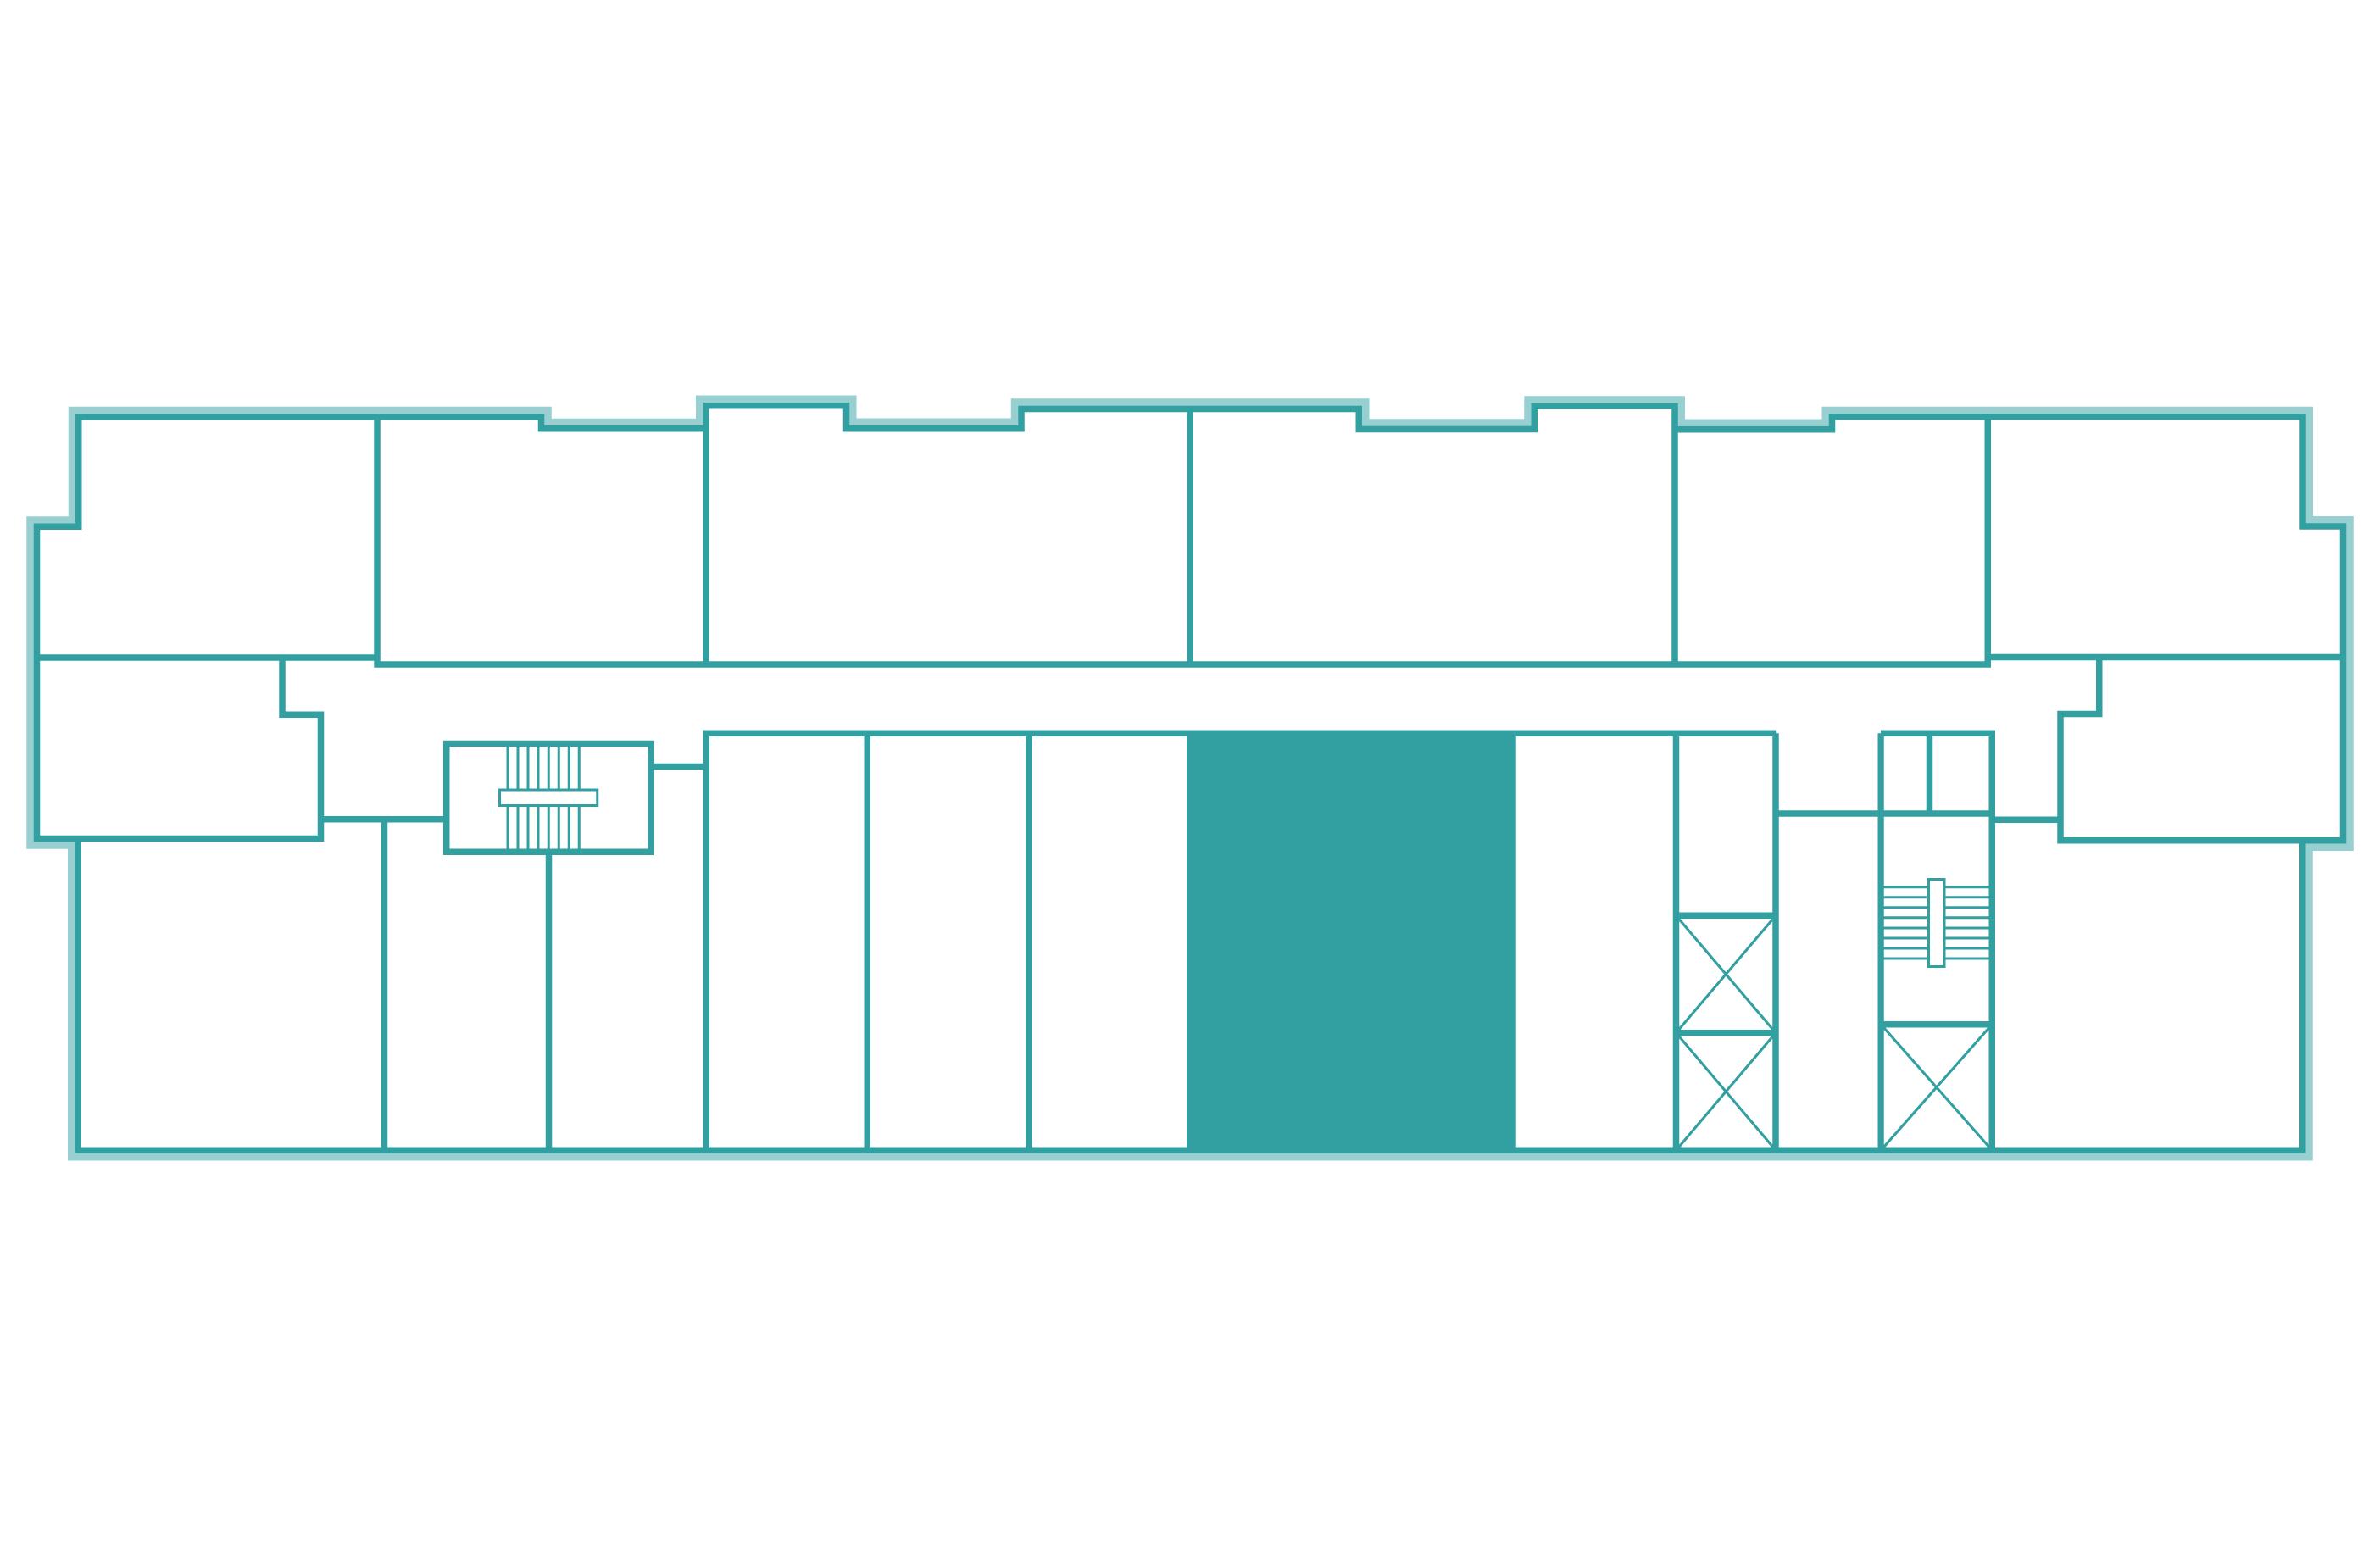 floorplan image of unit image 0502